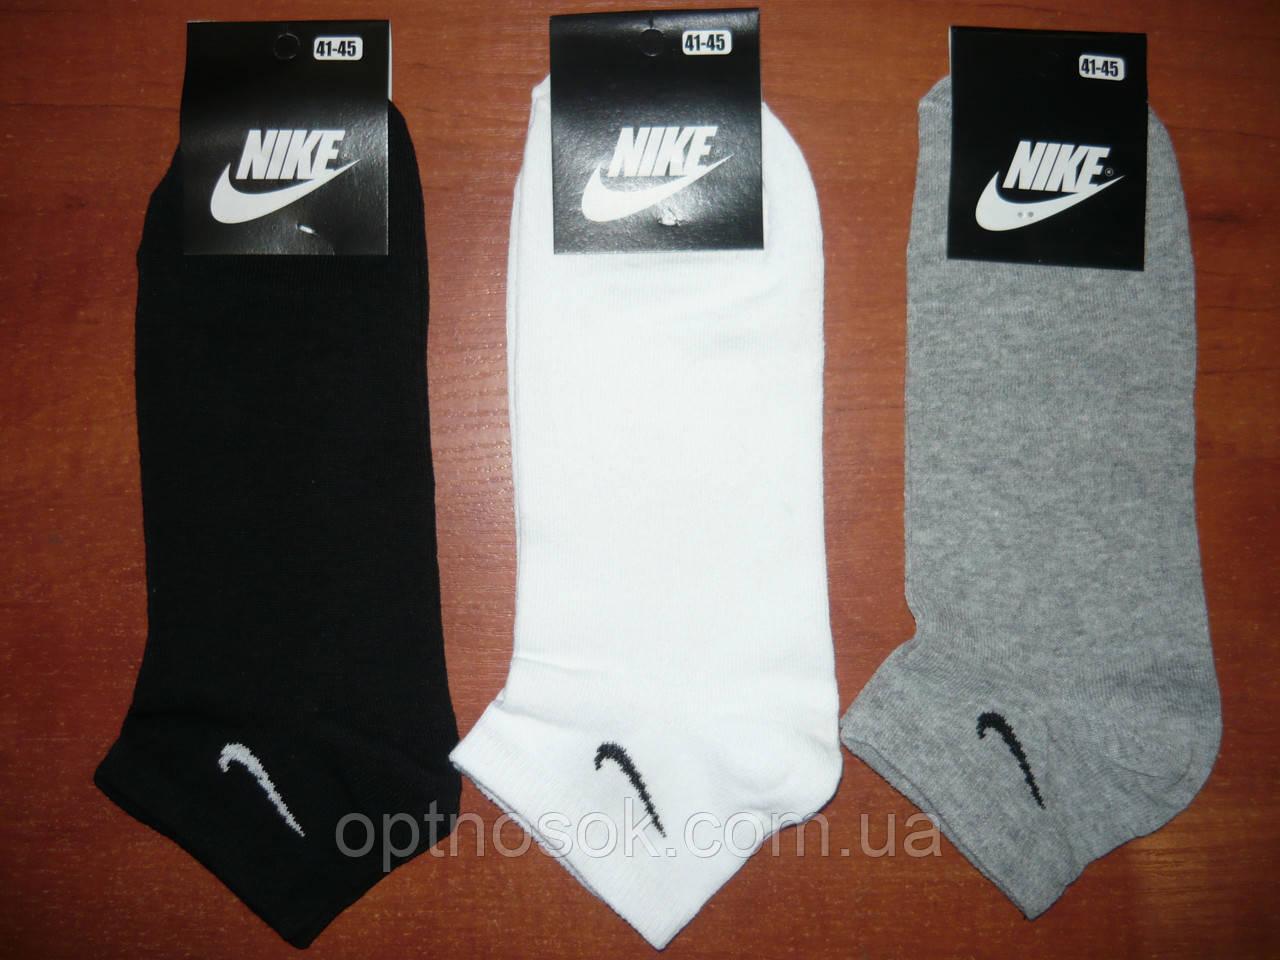 "Мужской носок ""в стиле"" Nike. Короткий. р. 41-45. Ассорти."